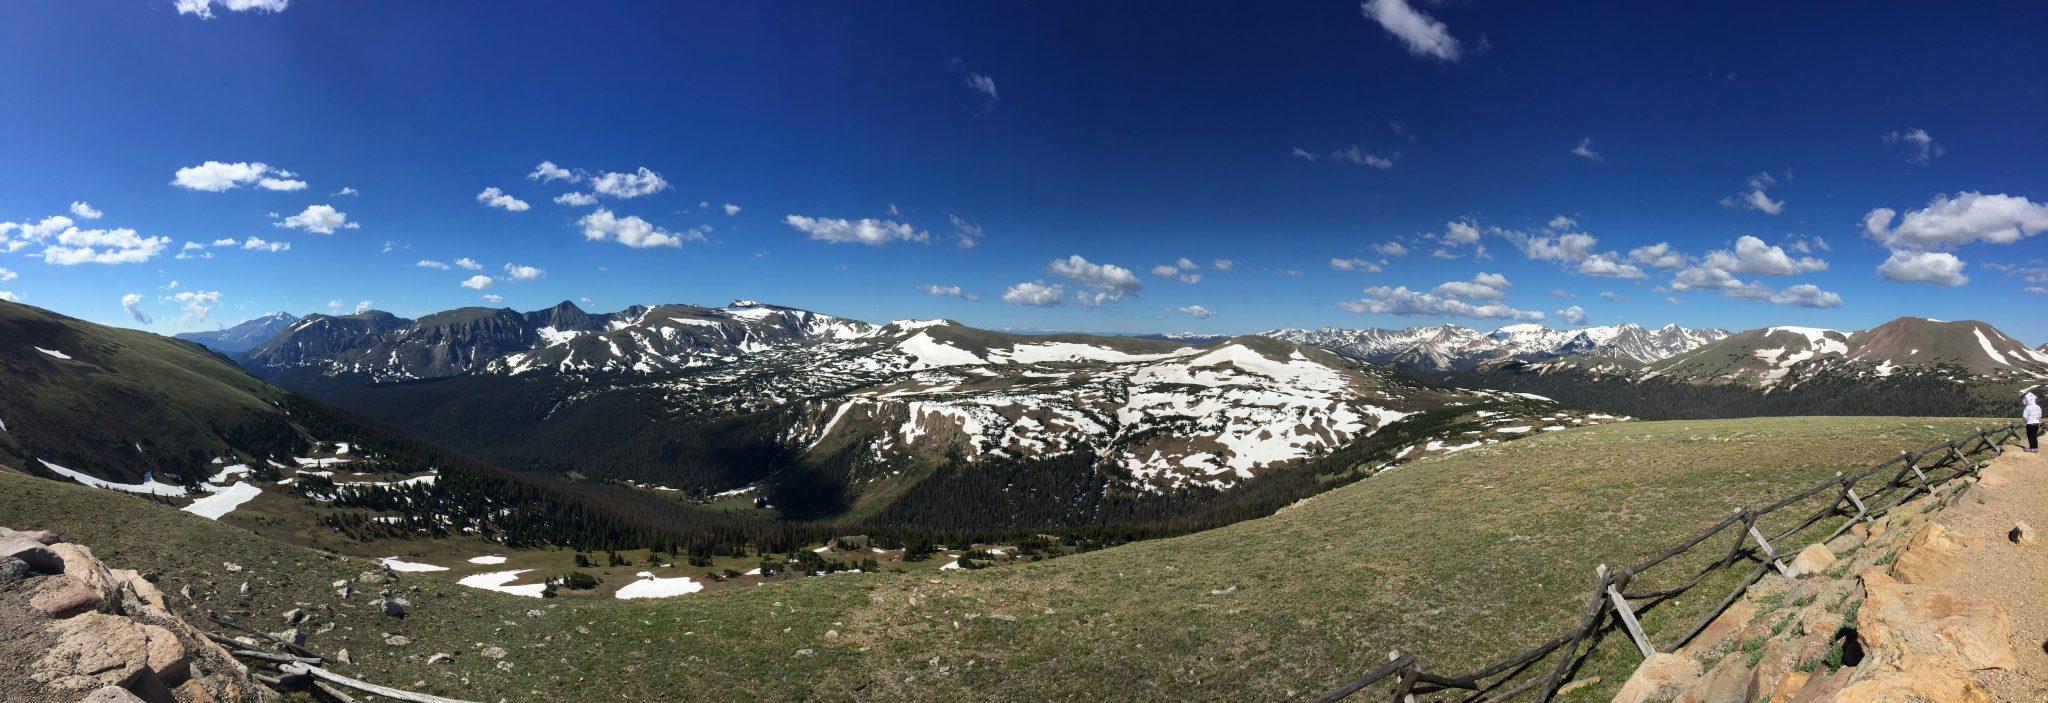 Alpine Tundra Rocky Mountain National Park